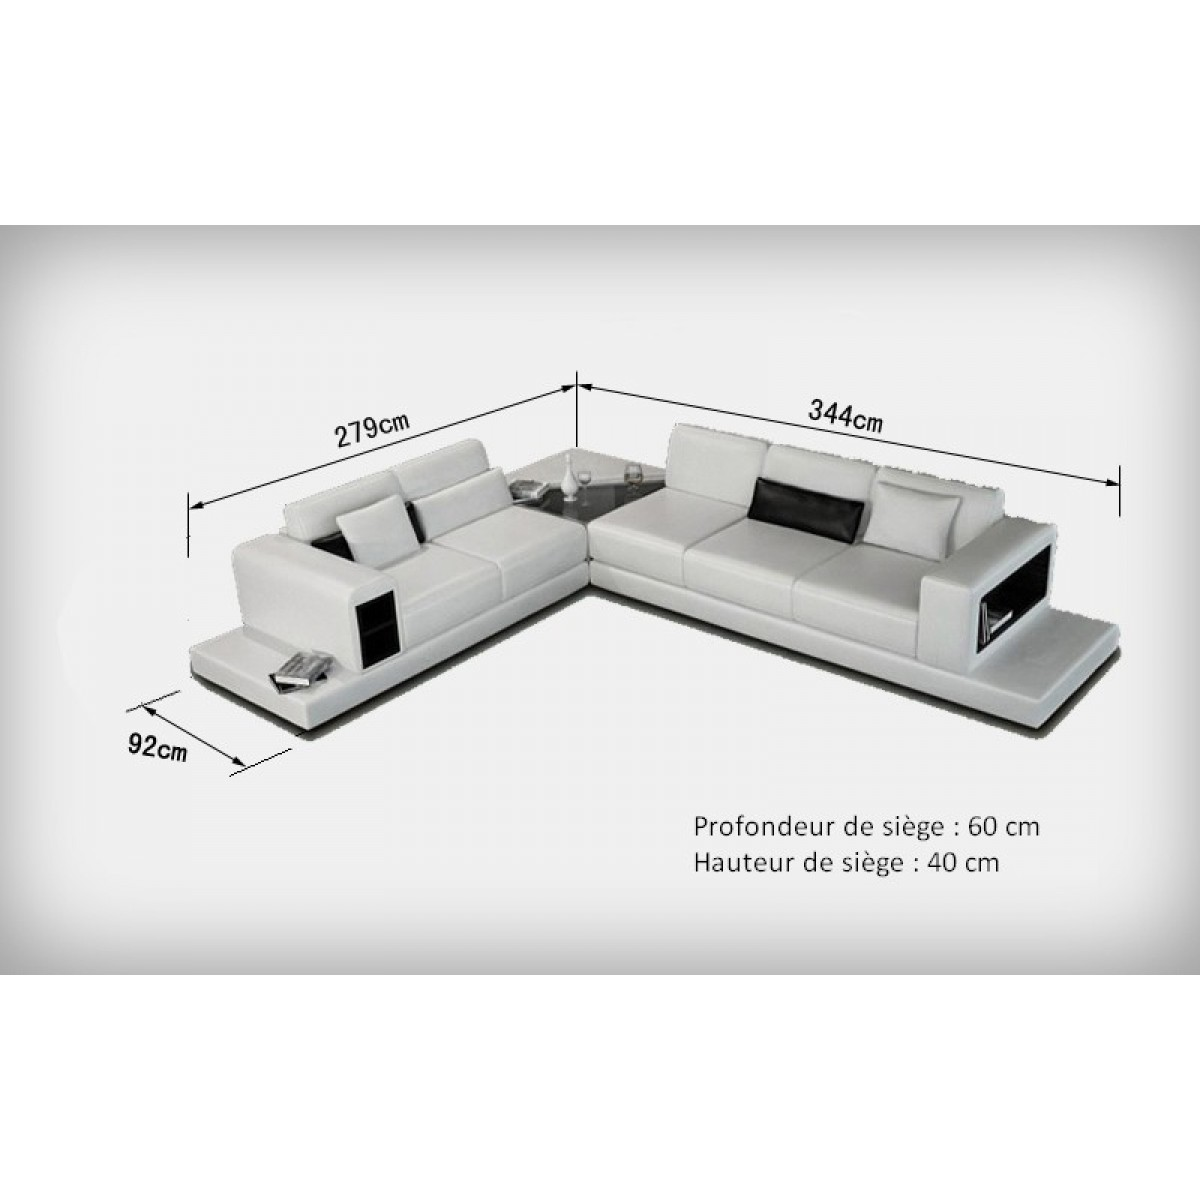 Canap d 39 angle design en cuir arezzo xl table int gr e - Dimension d un canape ...